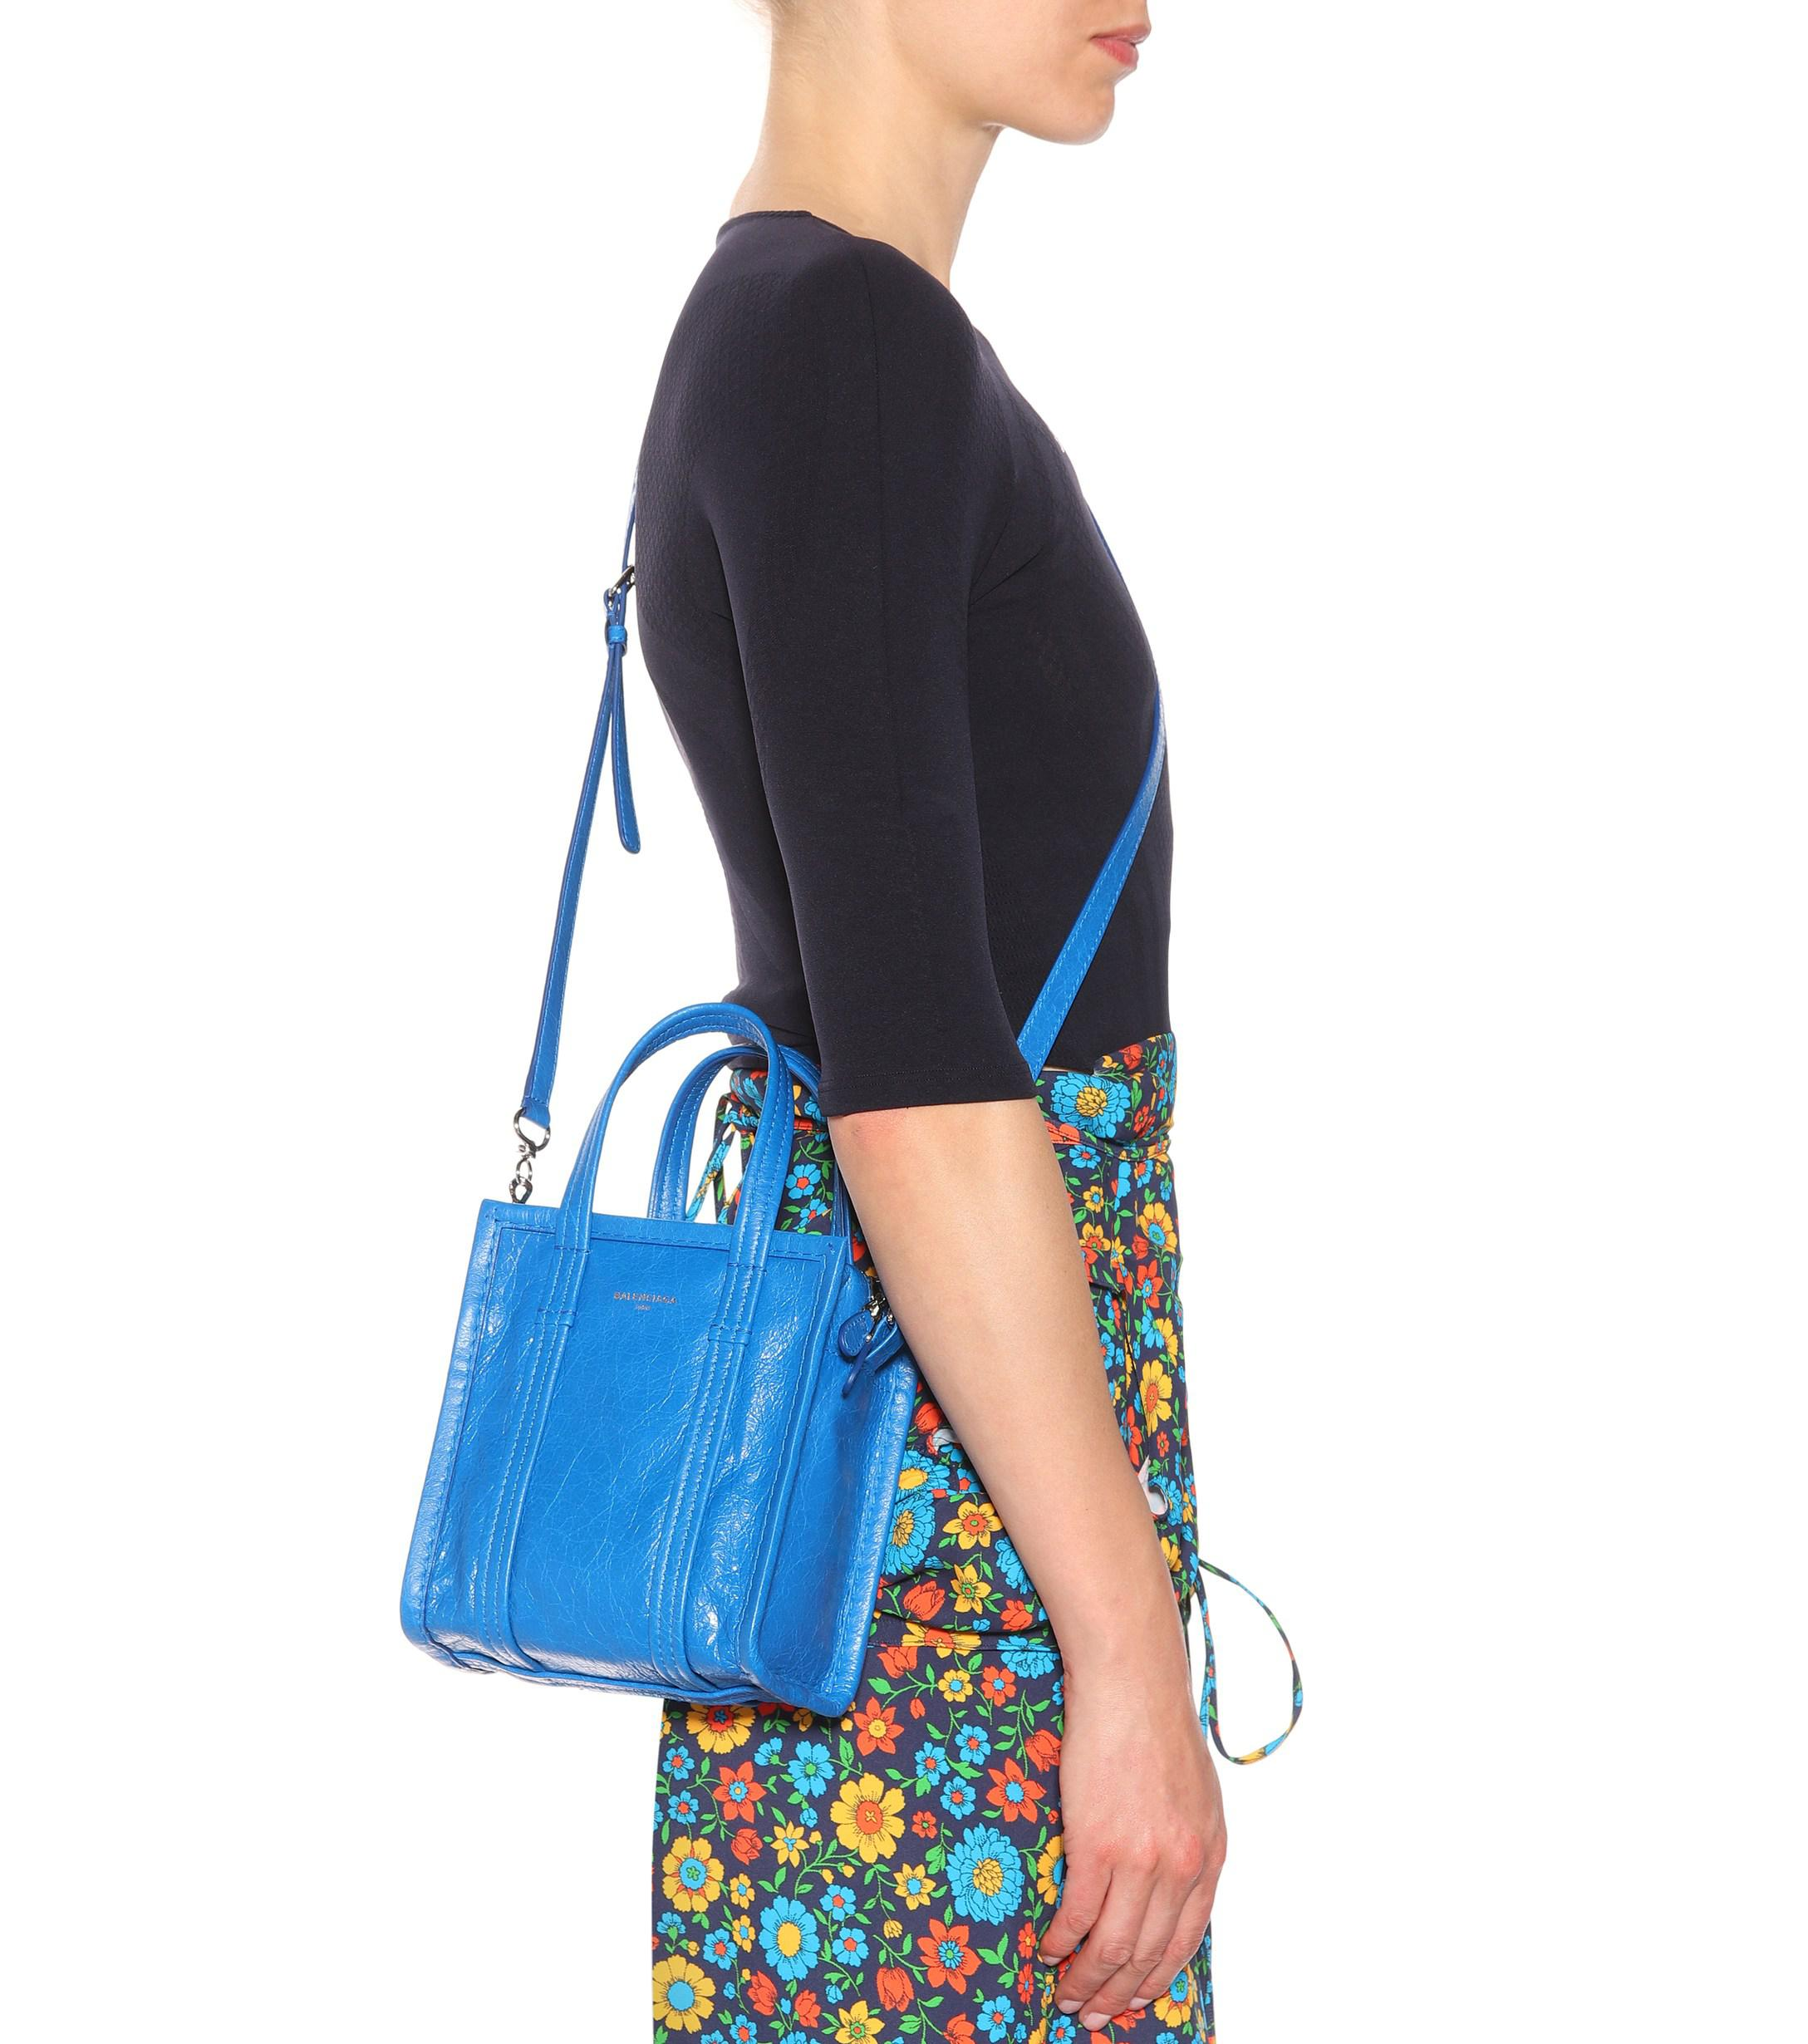 c50e0131a Balenciaga Bazar Xxs Leather Shopper in Blue - Lyst